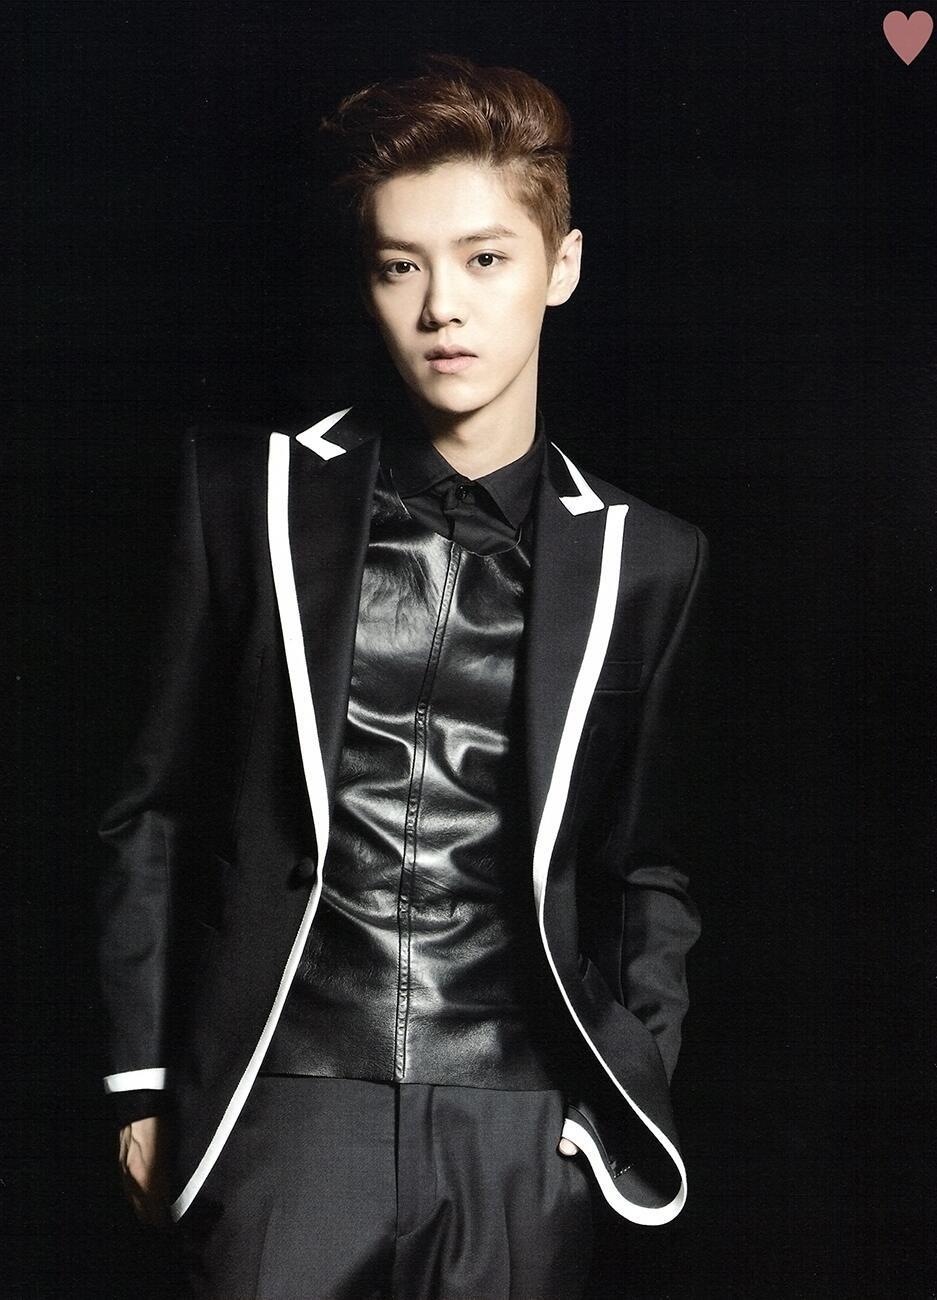 Luhan [SCAN] Exo Concert: THE LOST PLANET goods brochure (cr: Twitter / yehet0408)